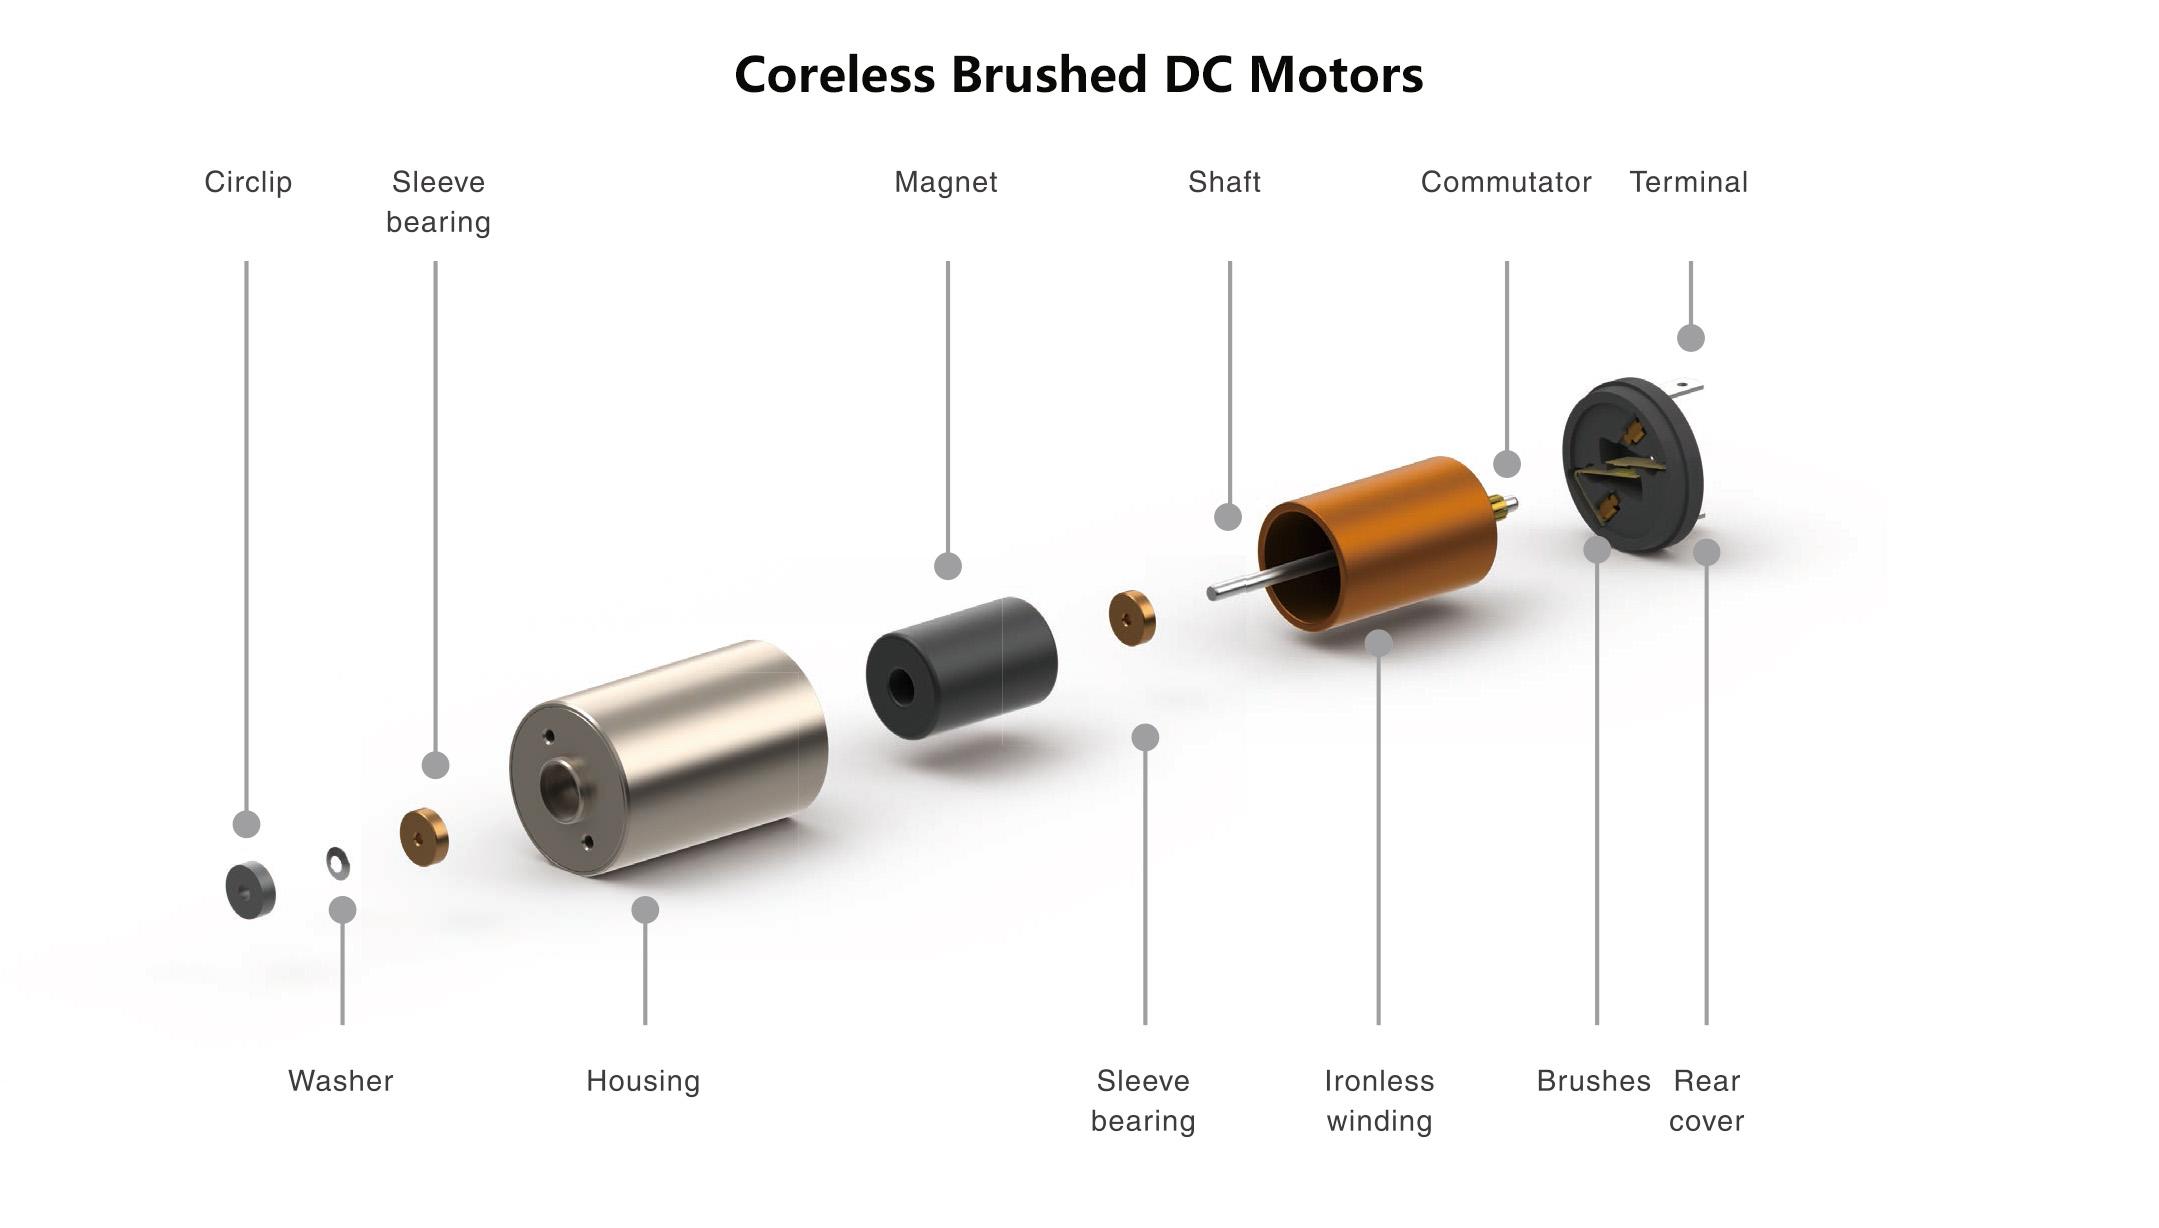 Coreless Brushed DC Motors Structure